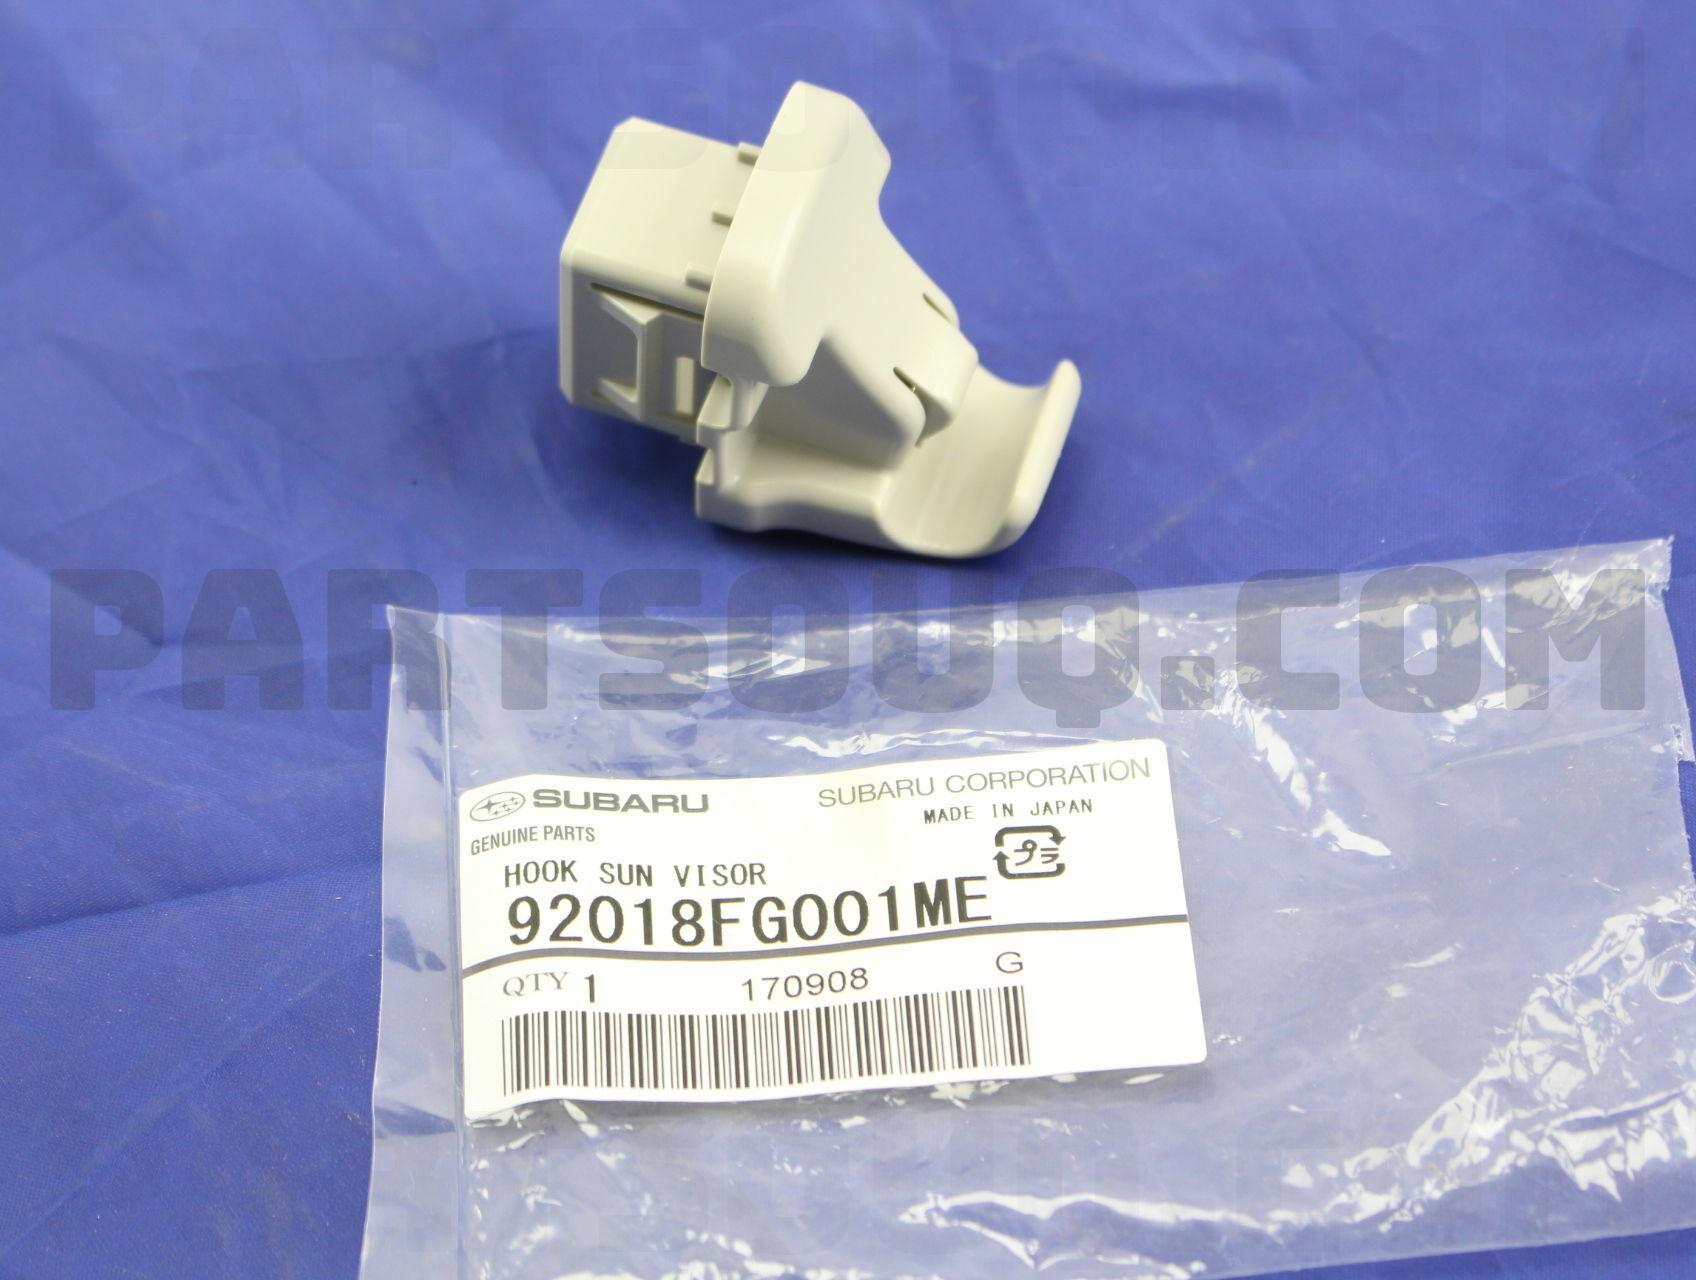 92018FG001ME Subaru HOOK SUN VISOR Price  2.32  345d24564a8